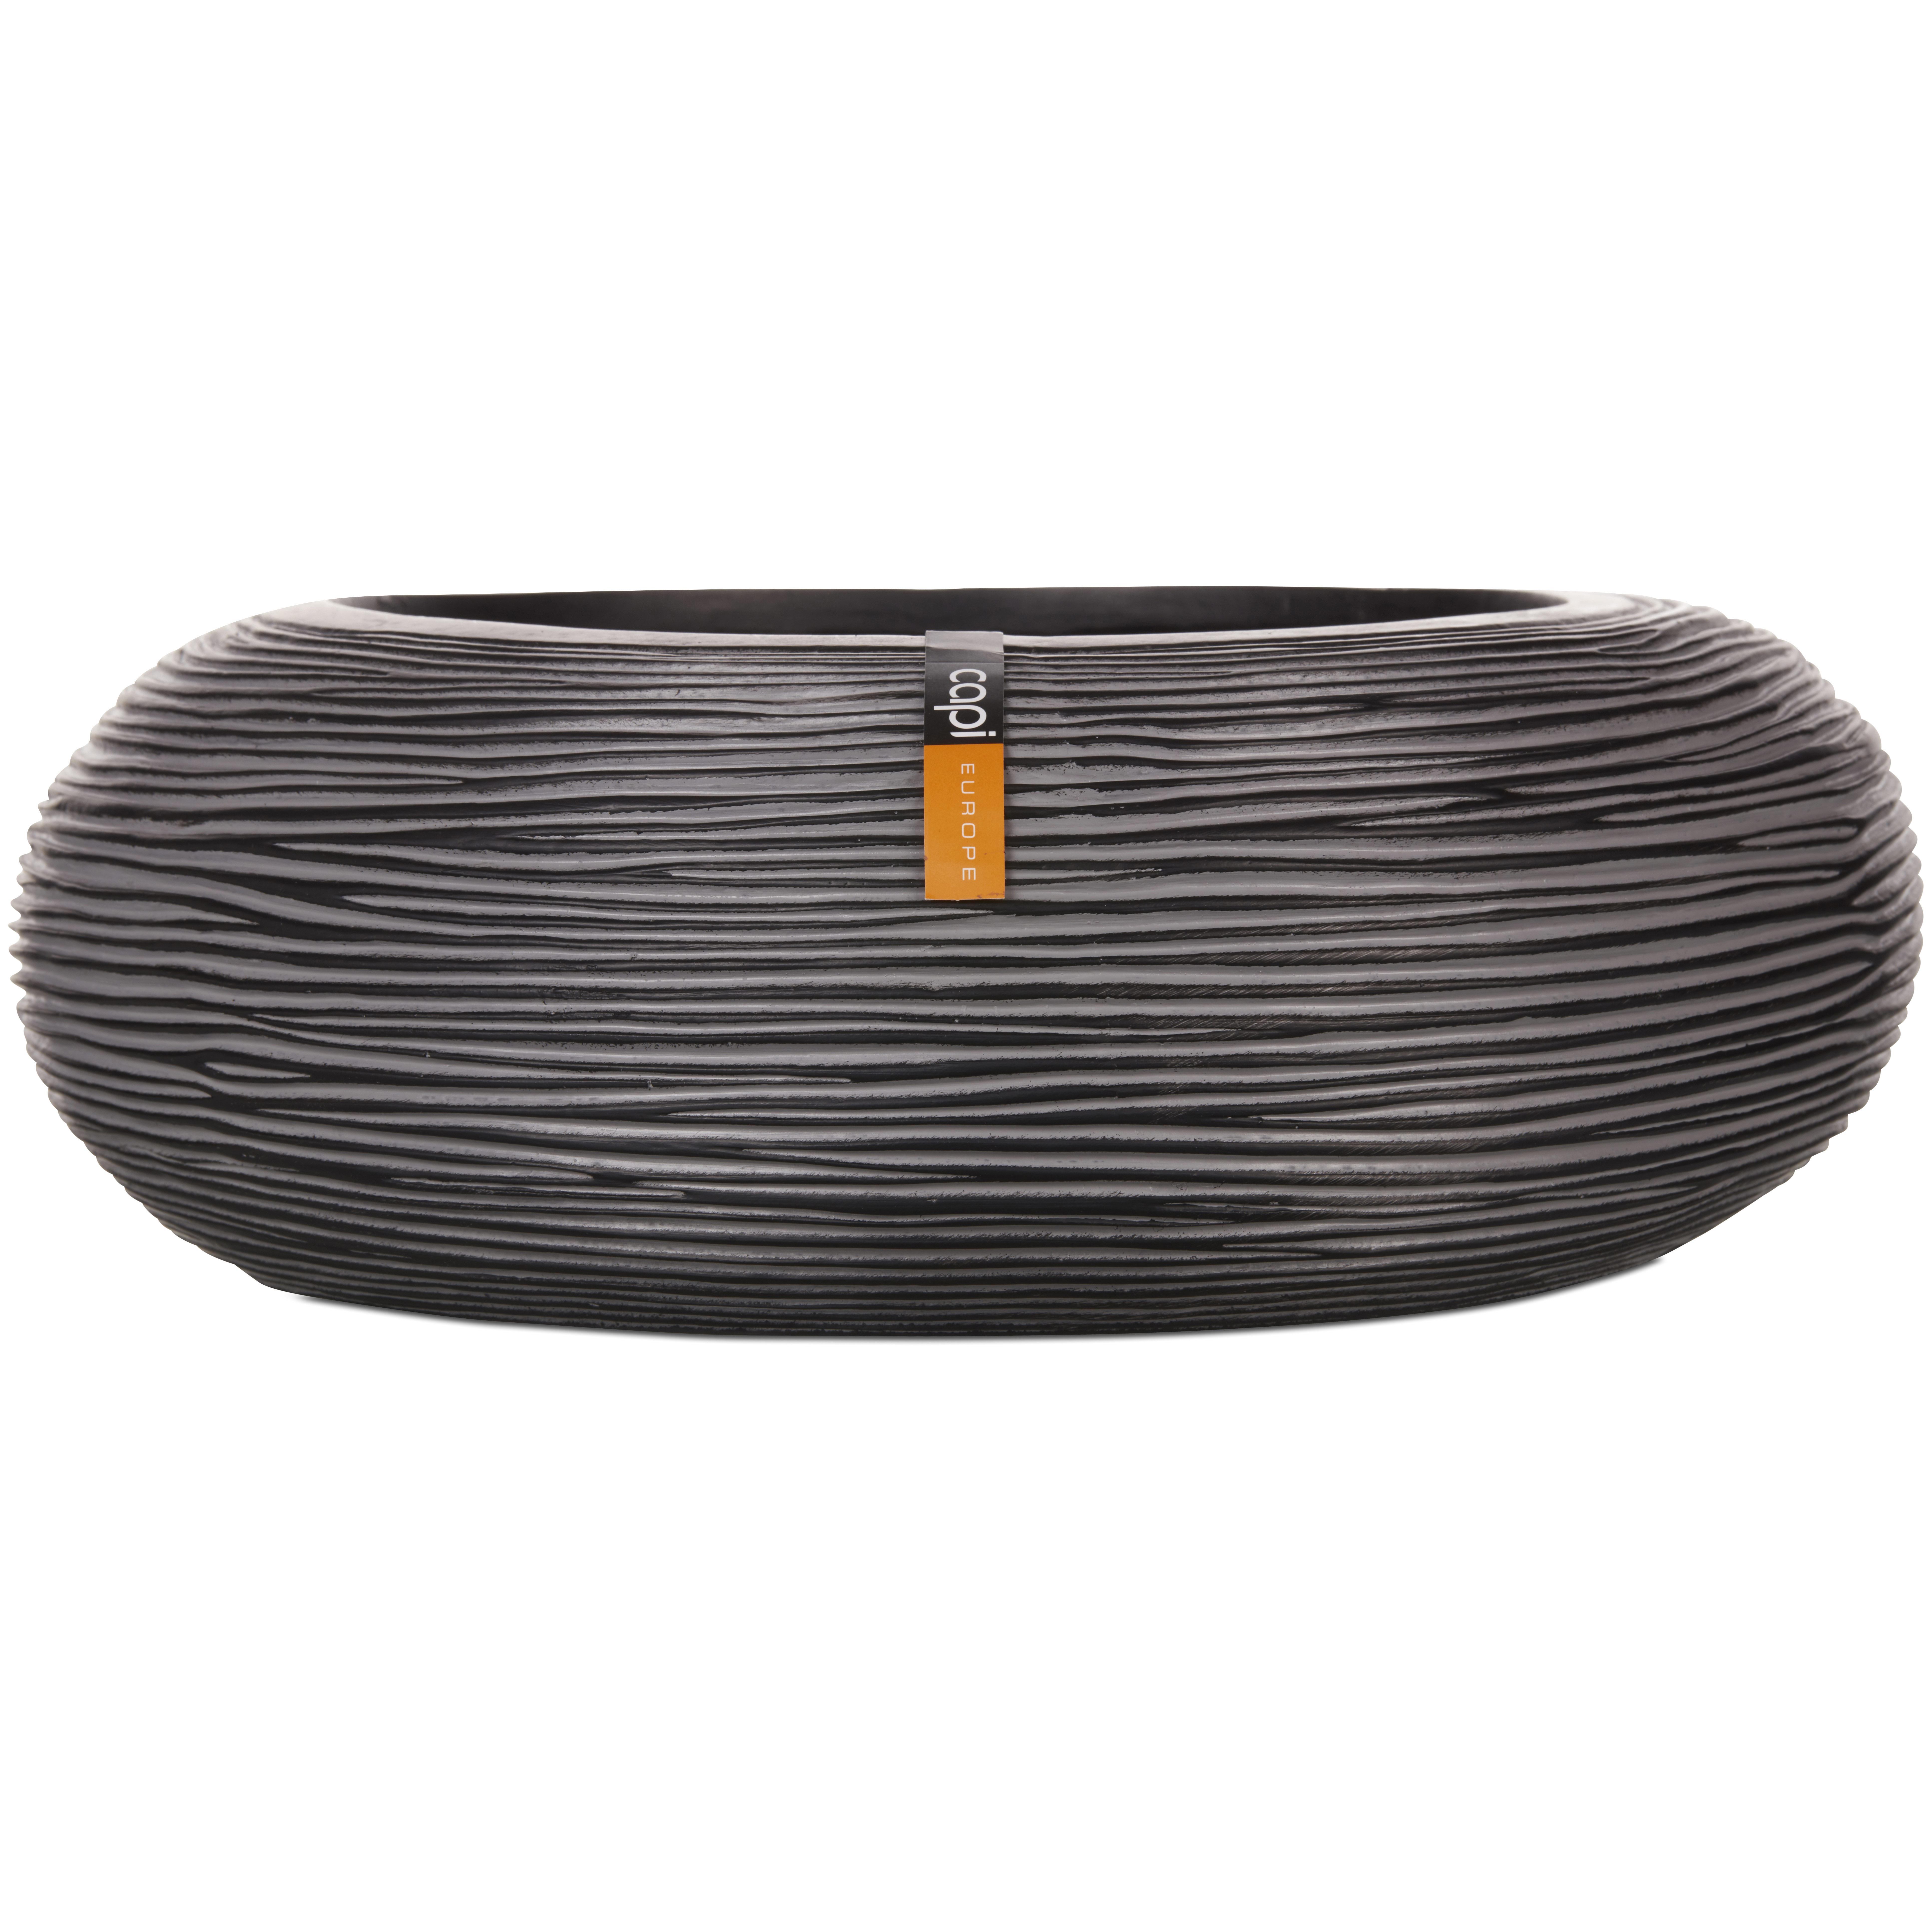 Capi Europe – Nature Rib Round Bowl – Black – 35cm